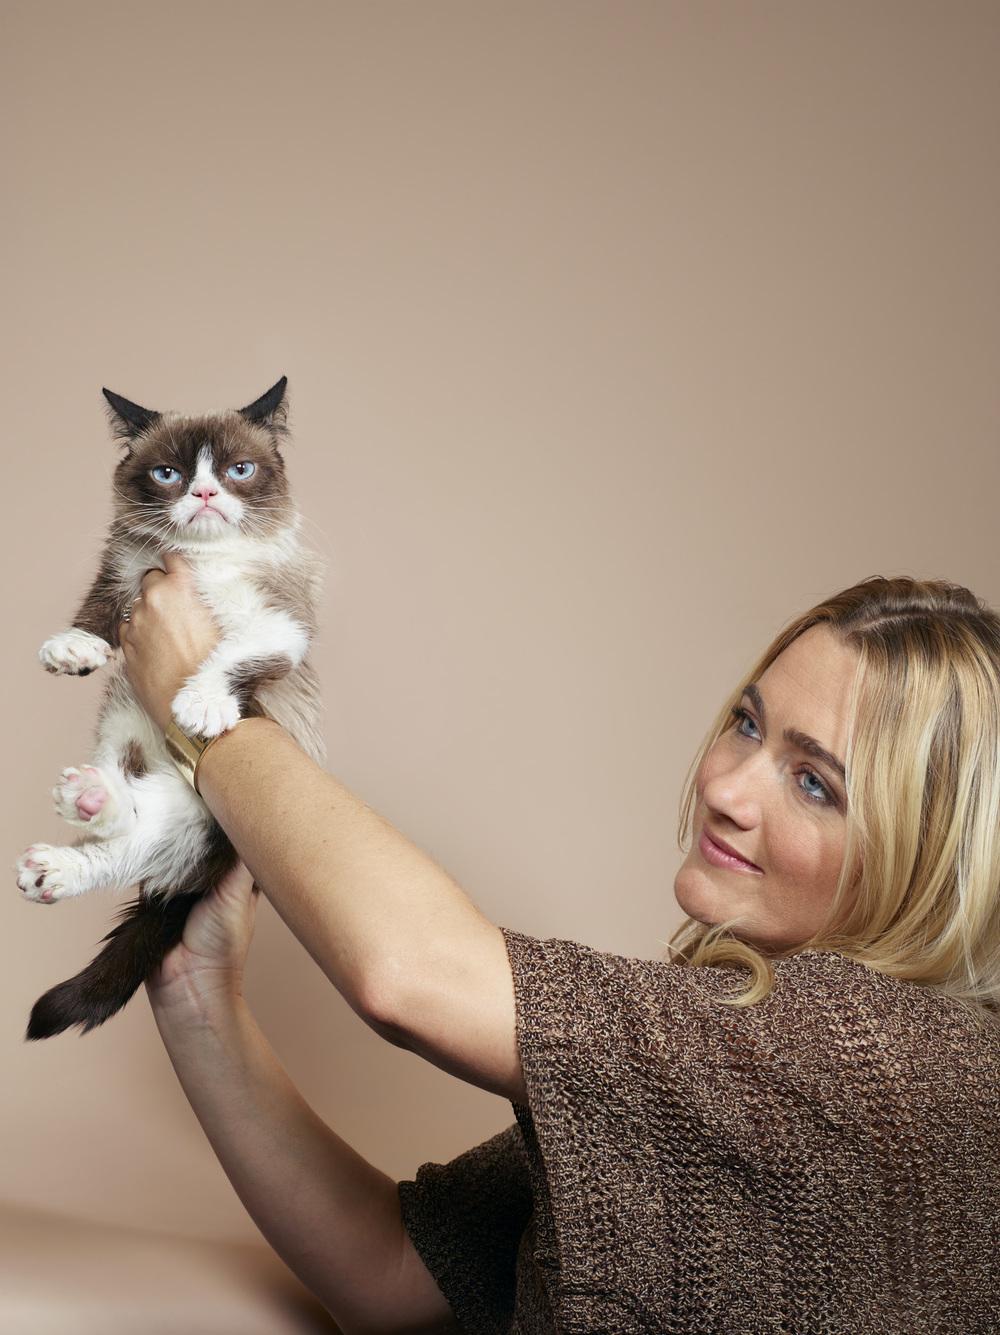 The Grumpy Cat, with owner Tabatha Bundesen